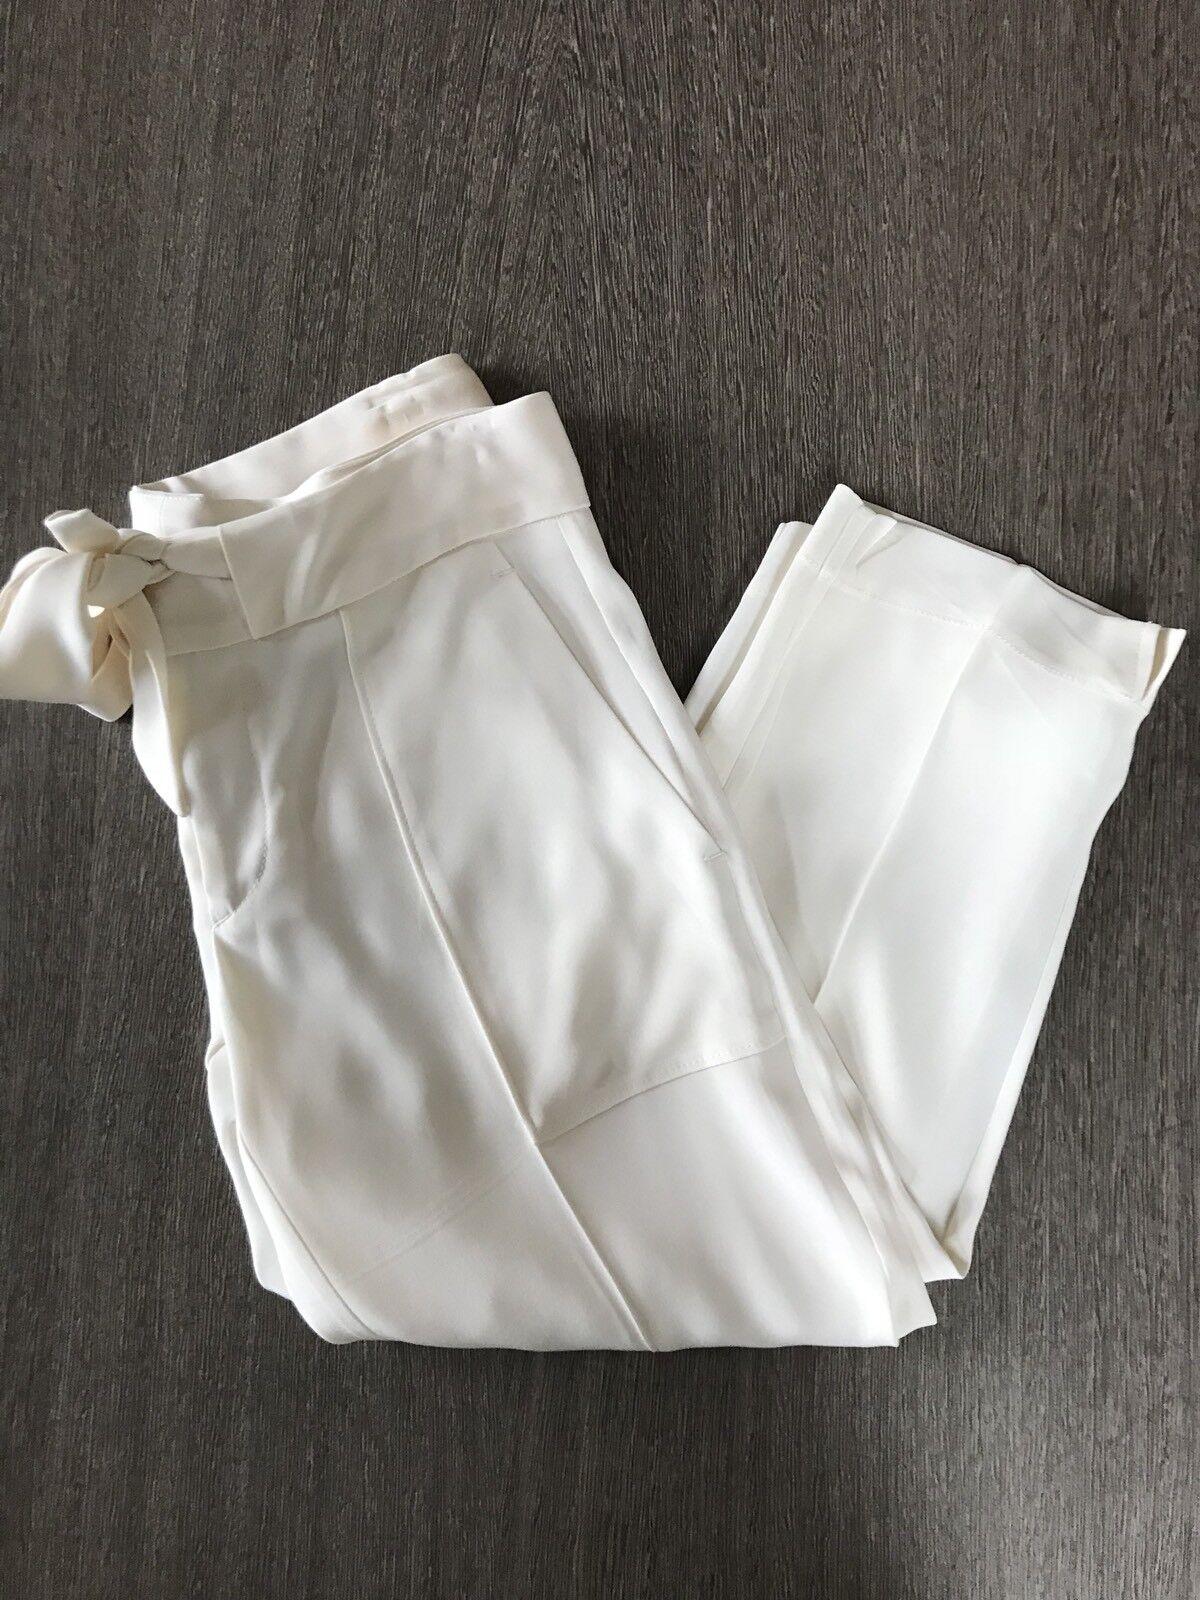 Rag & Bone Creme Ivory Capri Dress Pant Size 2